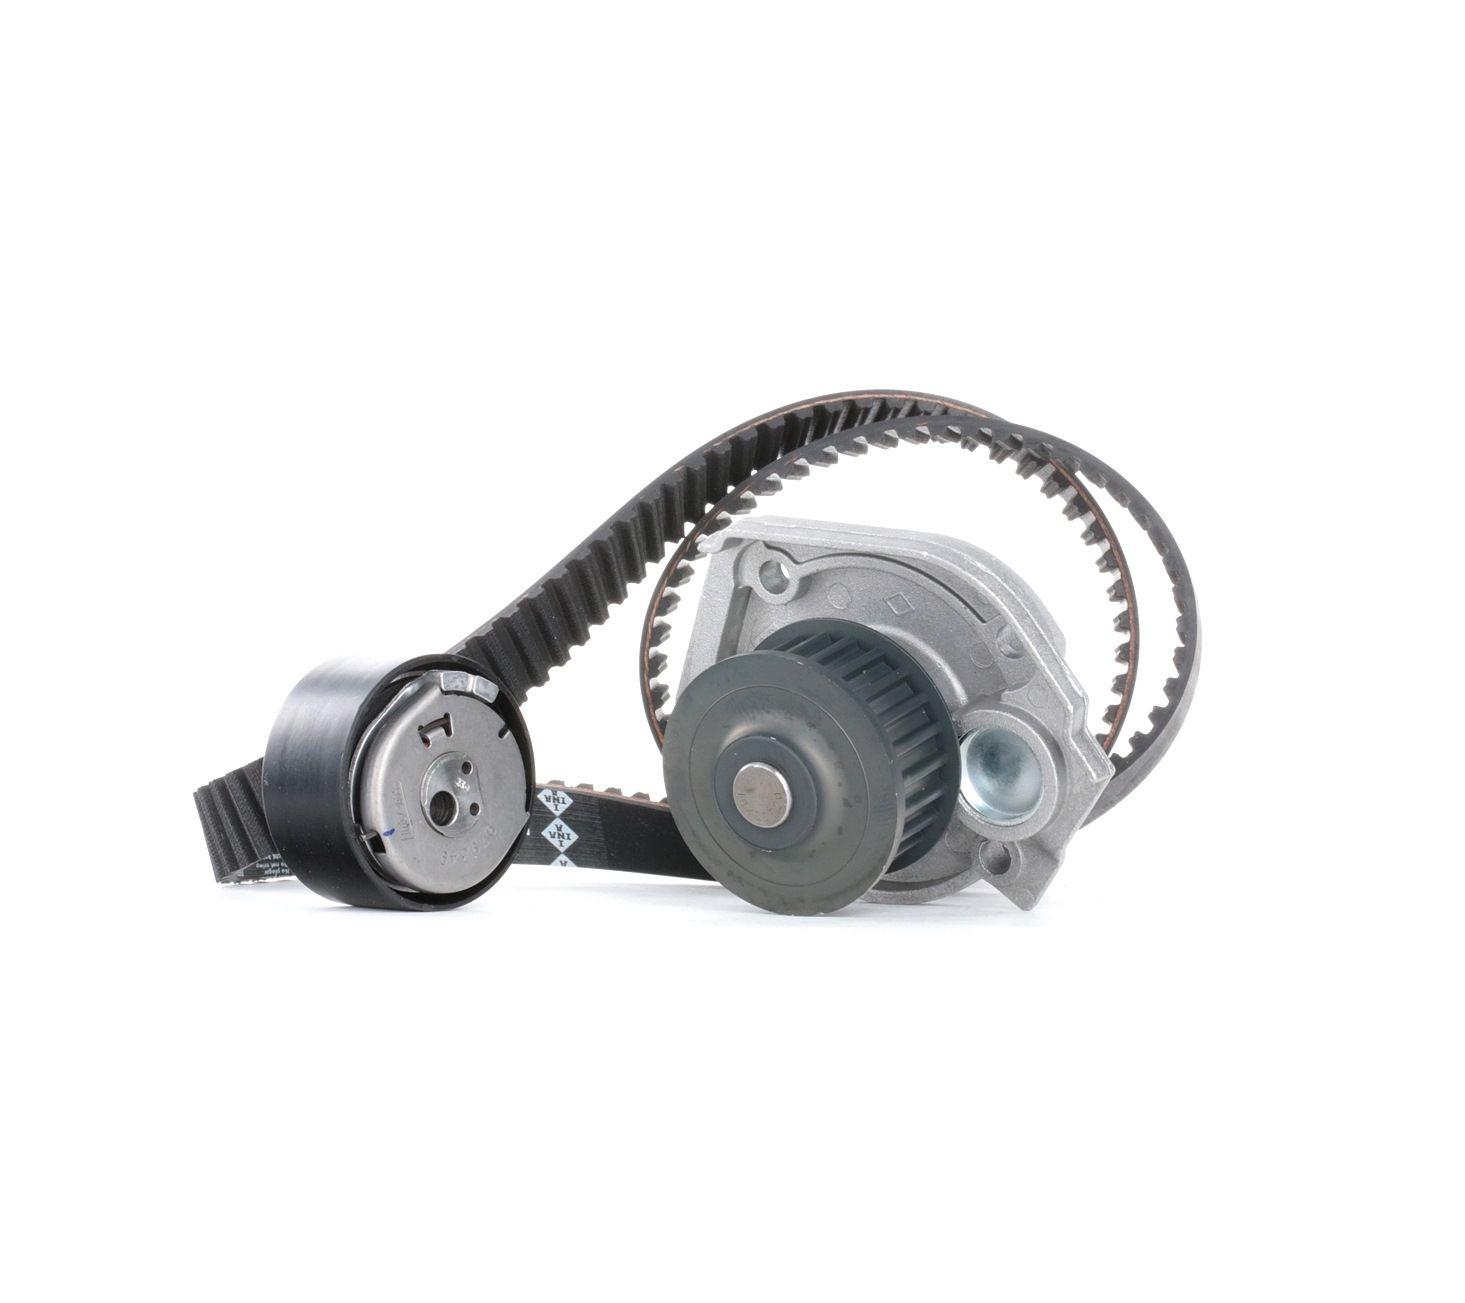 Bomba de Agua + Juego de Distribución INA 530 0228 30 evaluación